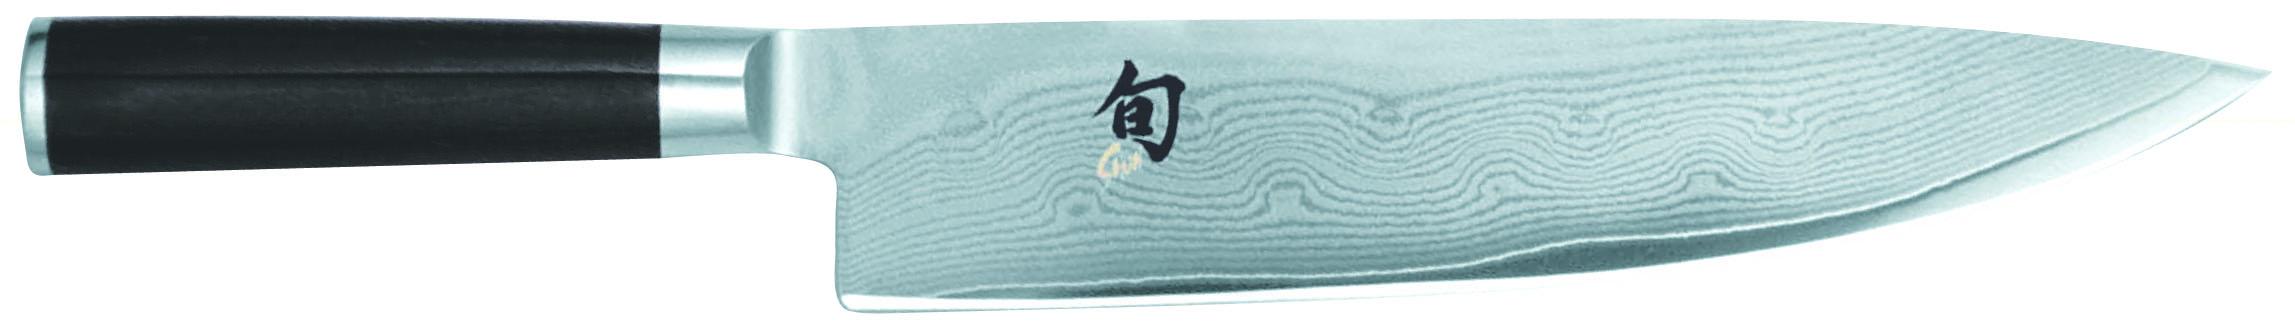 Kai Shun Classic DM-0707 Kockkniv255 cm